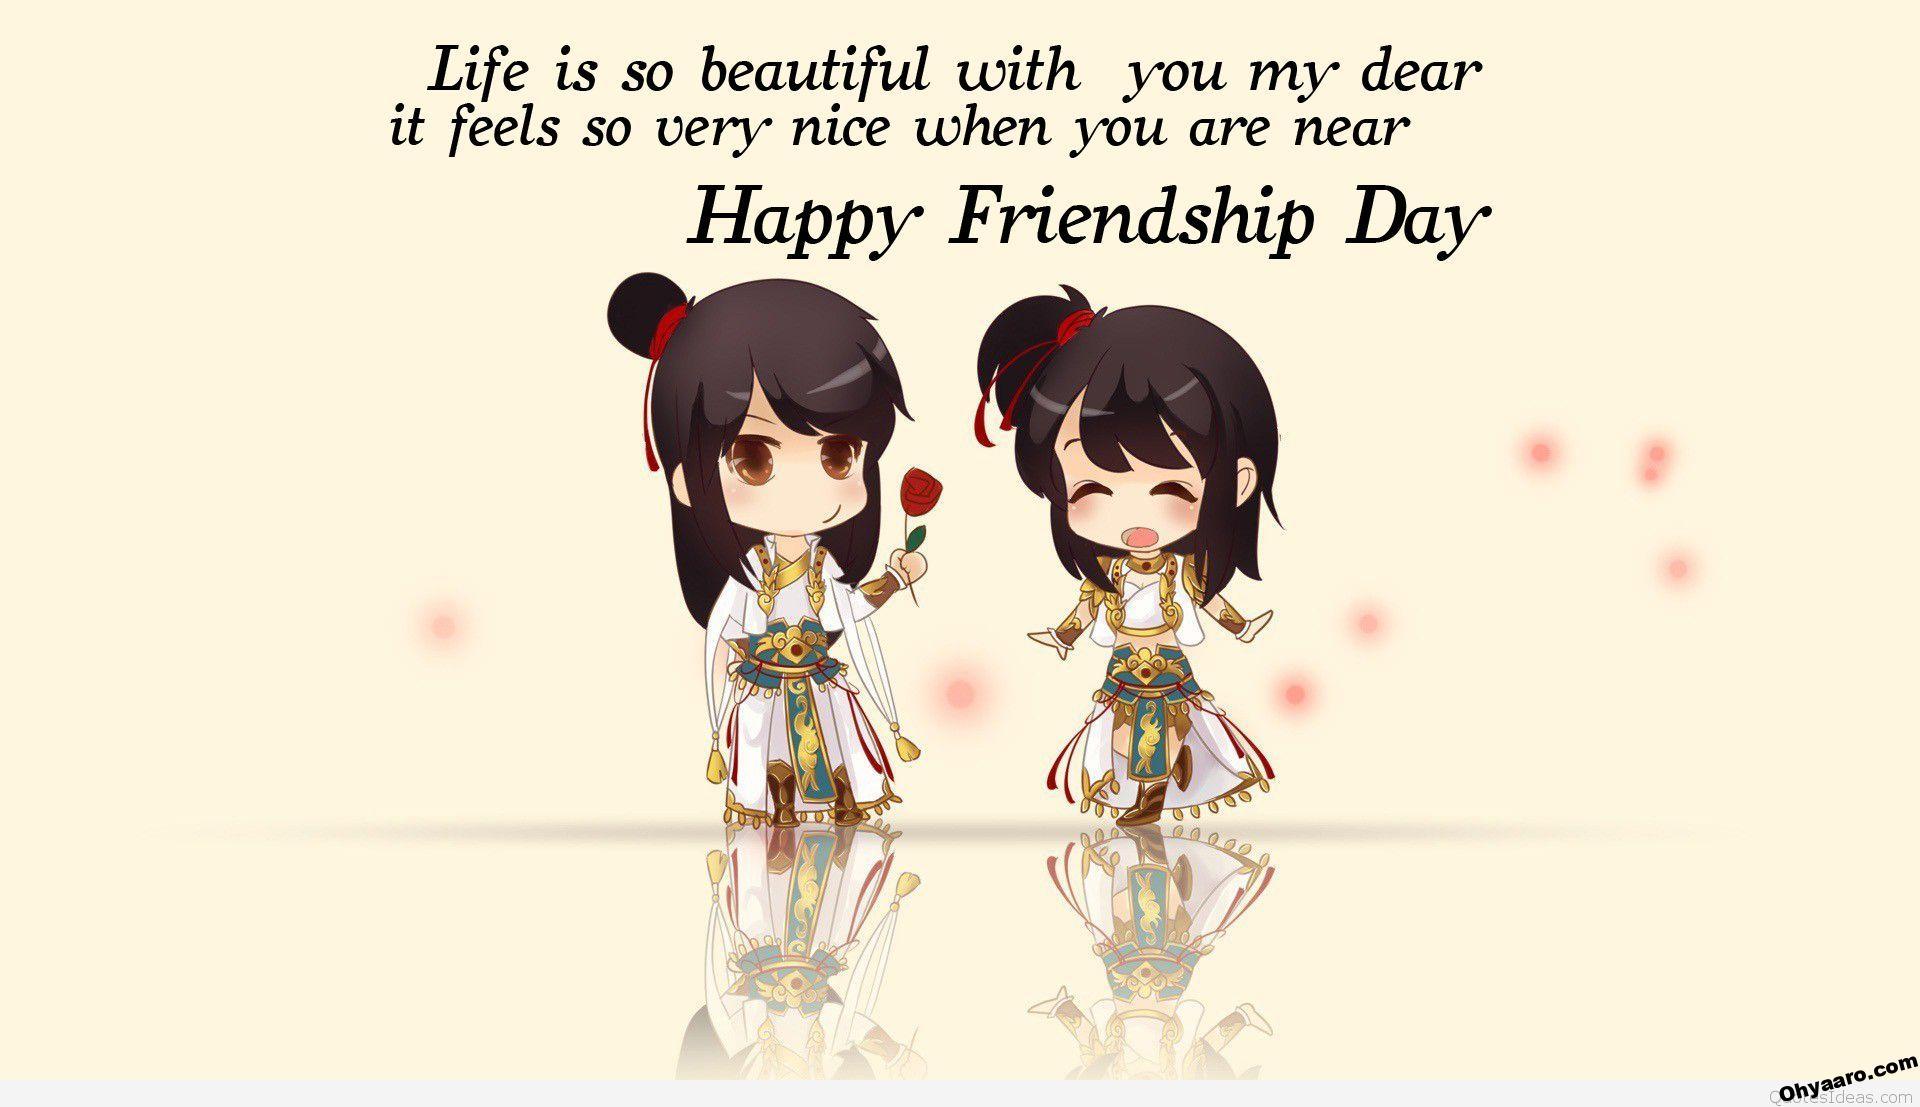 friendship day wallpaper cartoon images]